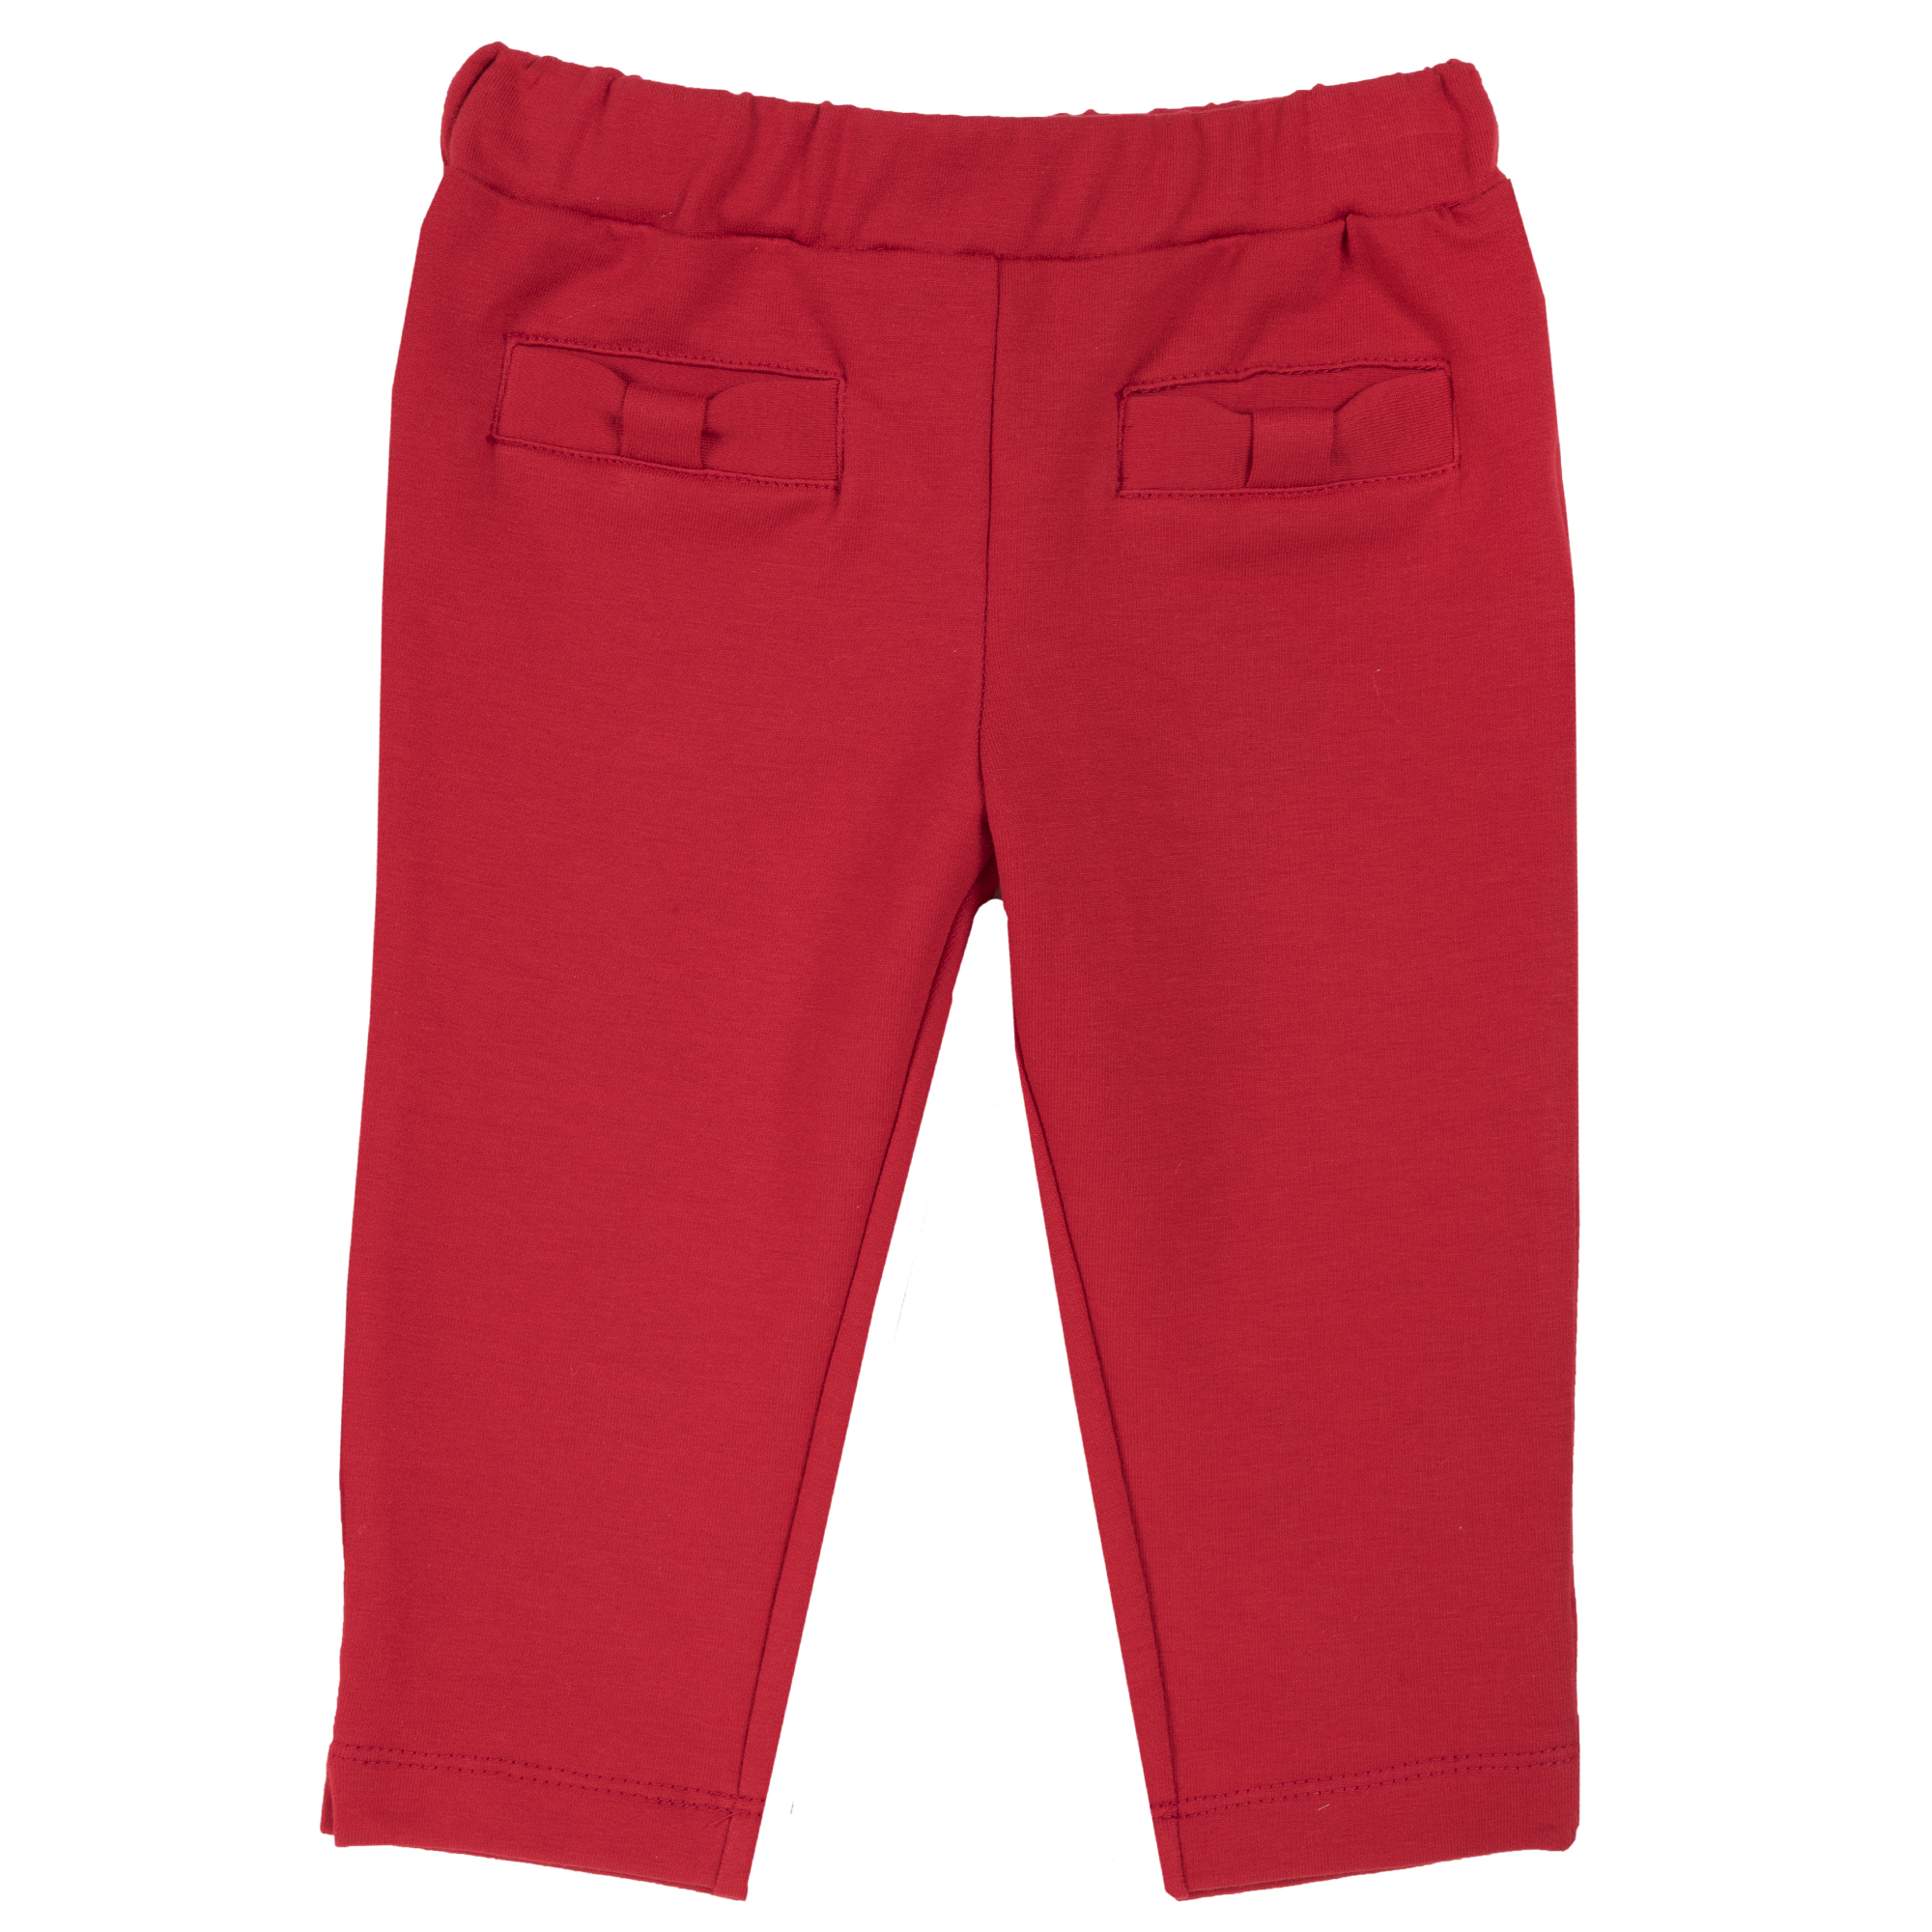 Pantalon lung copii Chicco, rosu, 24930 din categoria Pantaloni copii